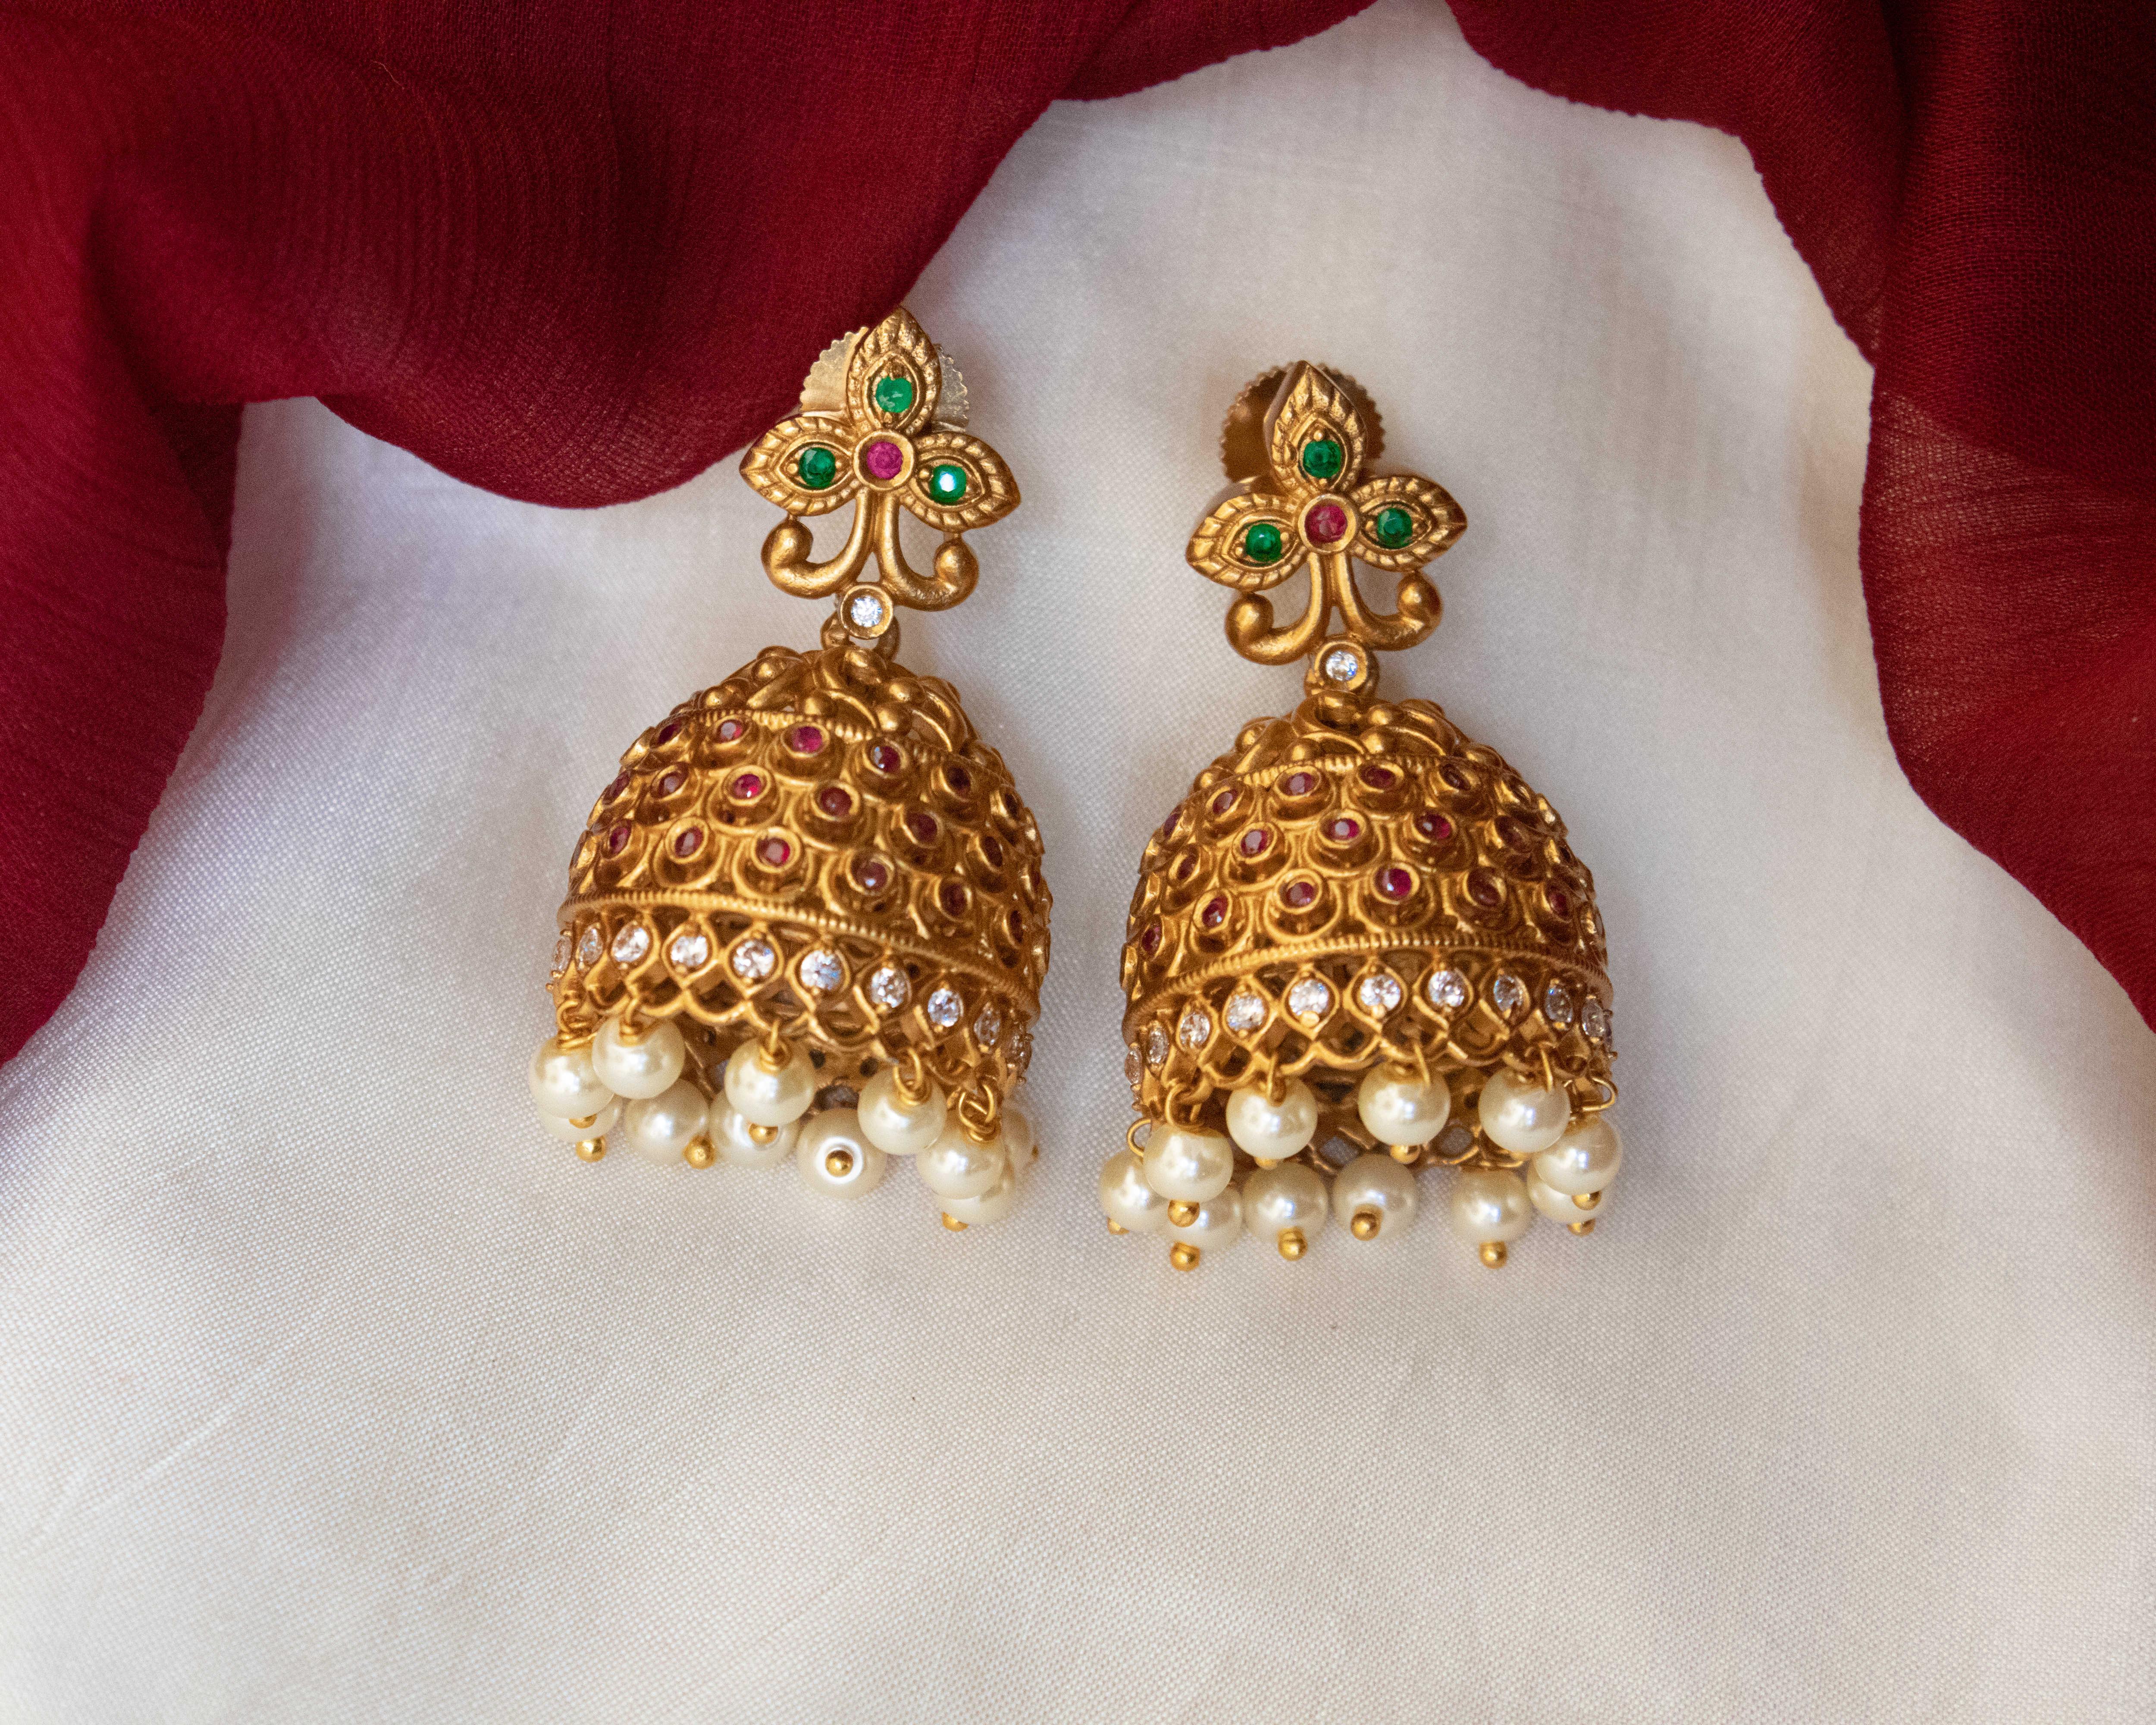 imitation-antique-jewellery-designs-3